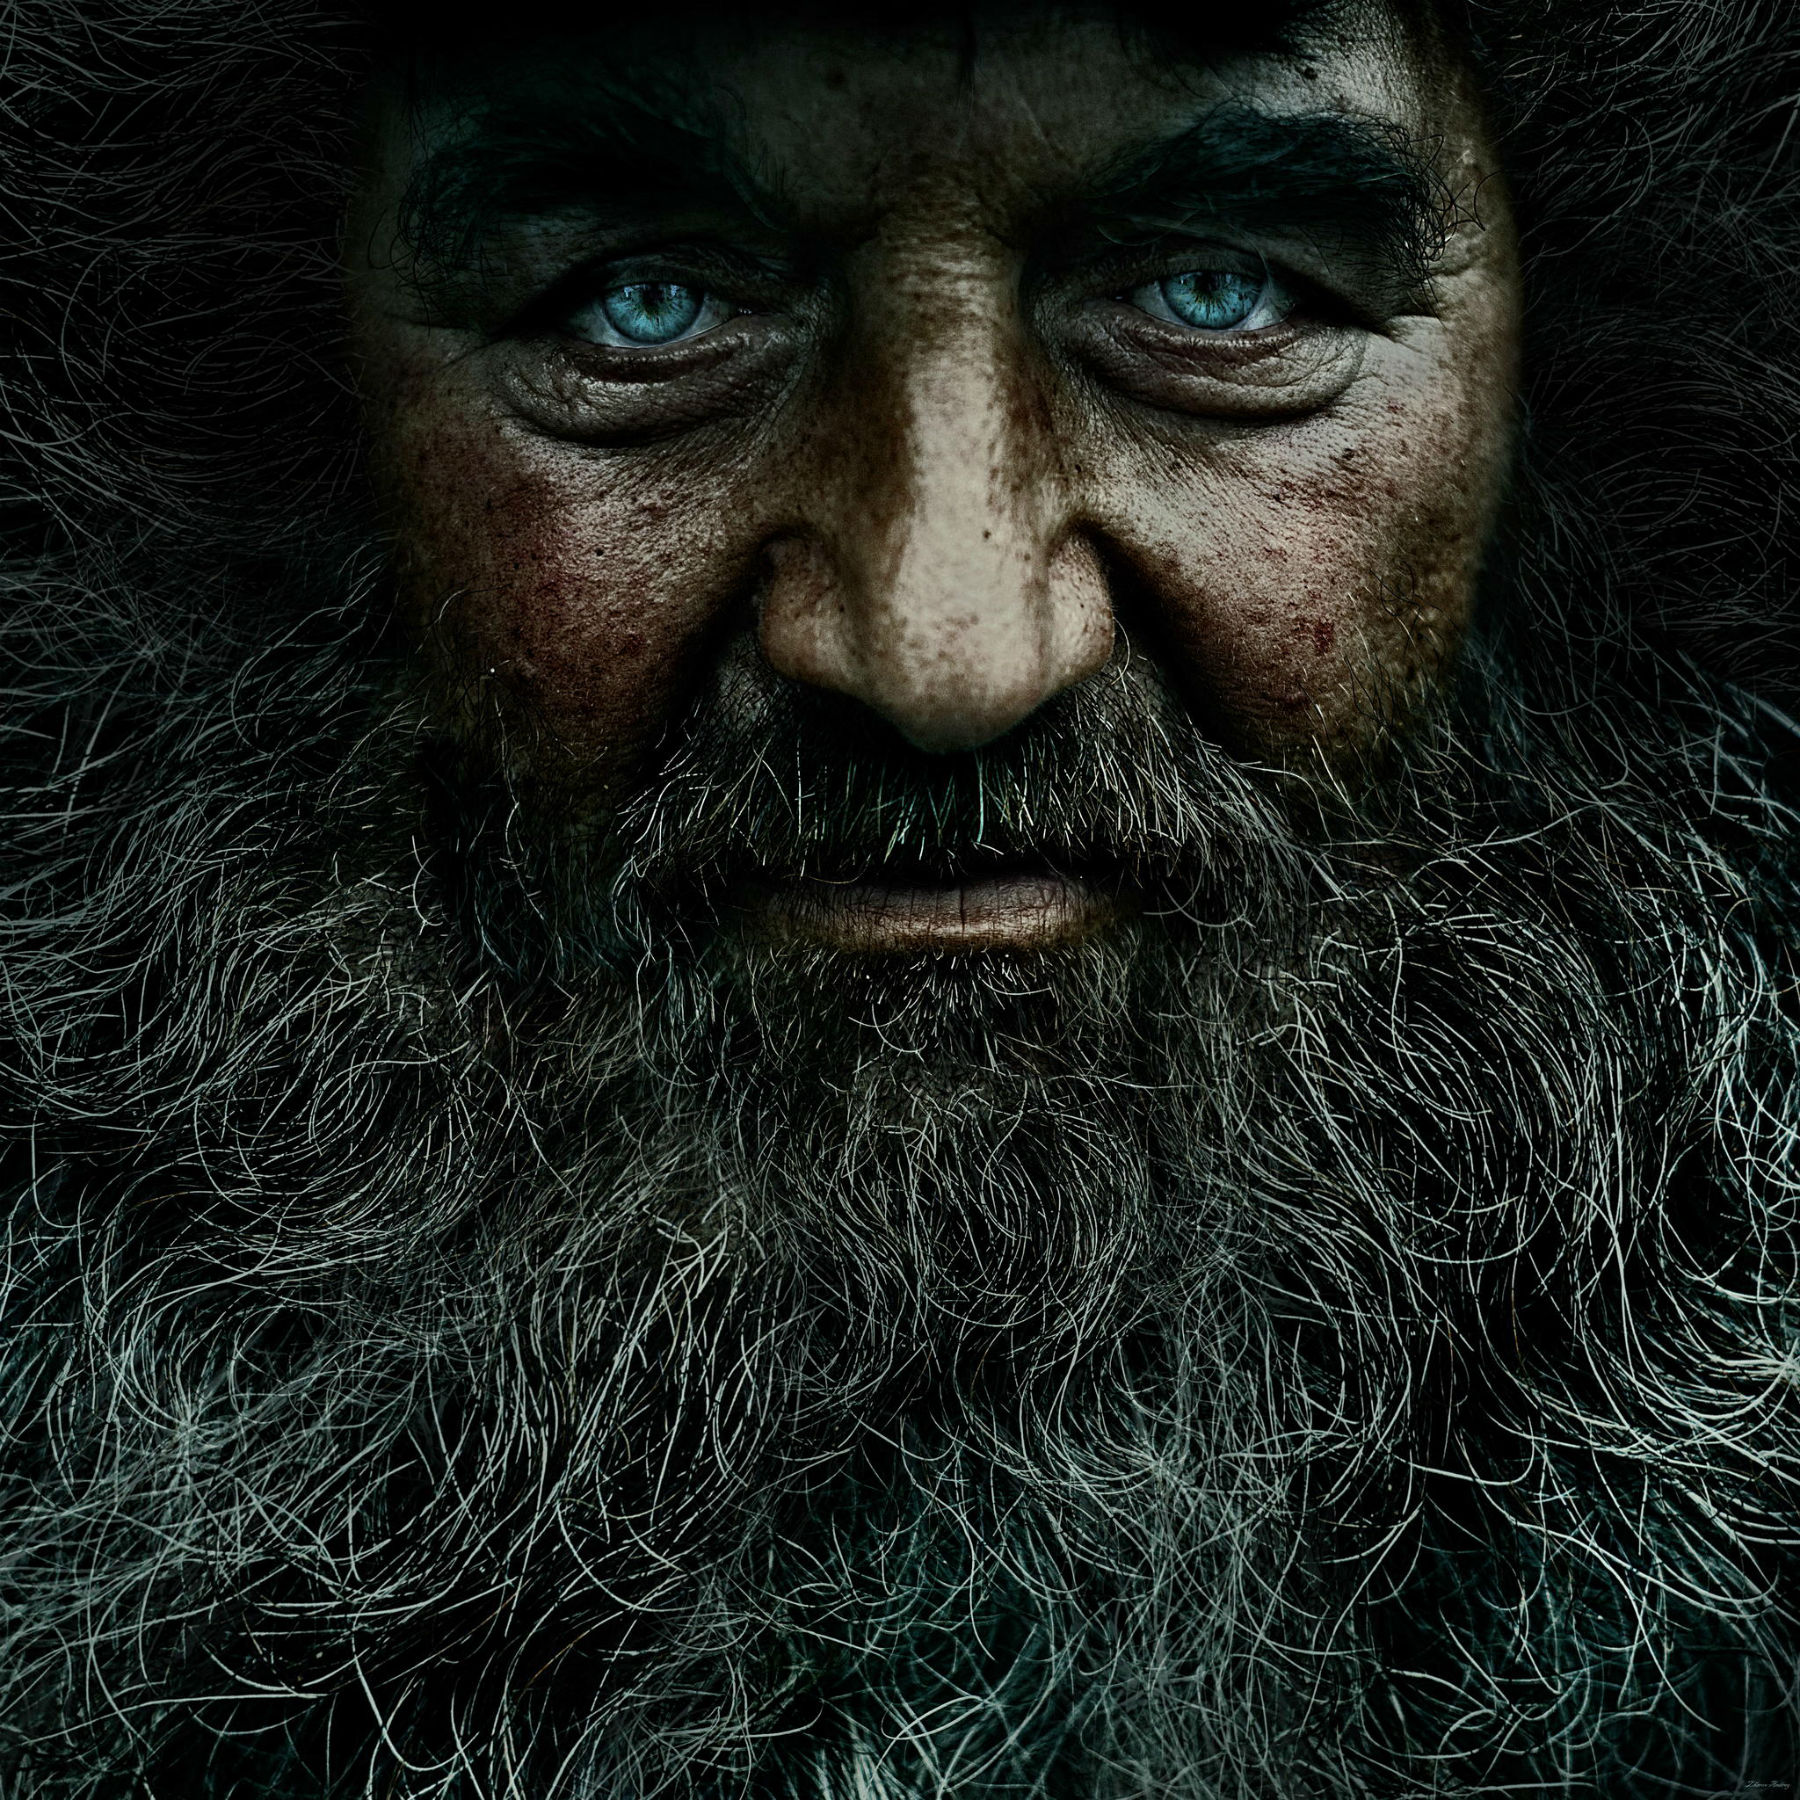 The Intensity of the Bearded Man | Scene360